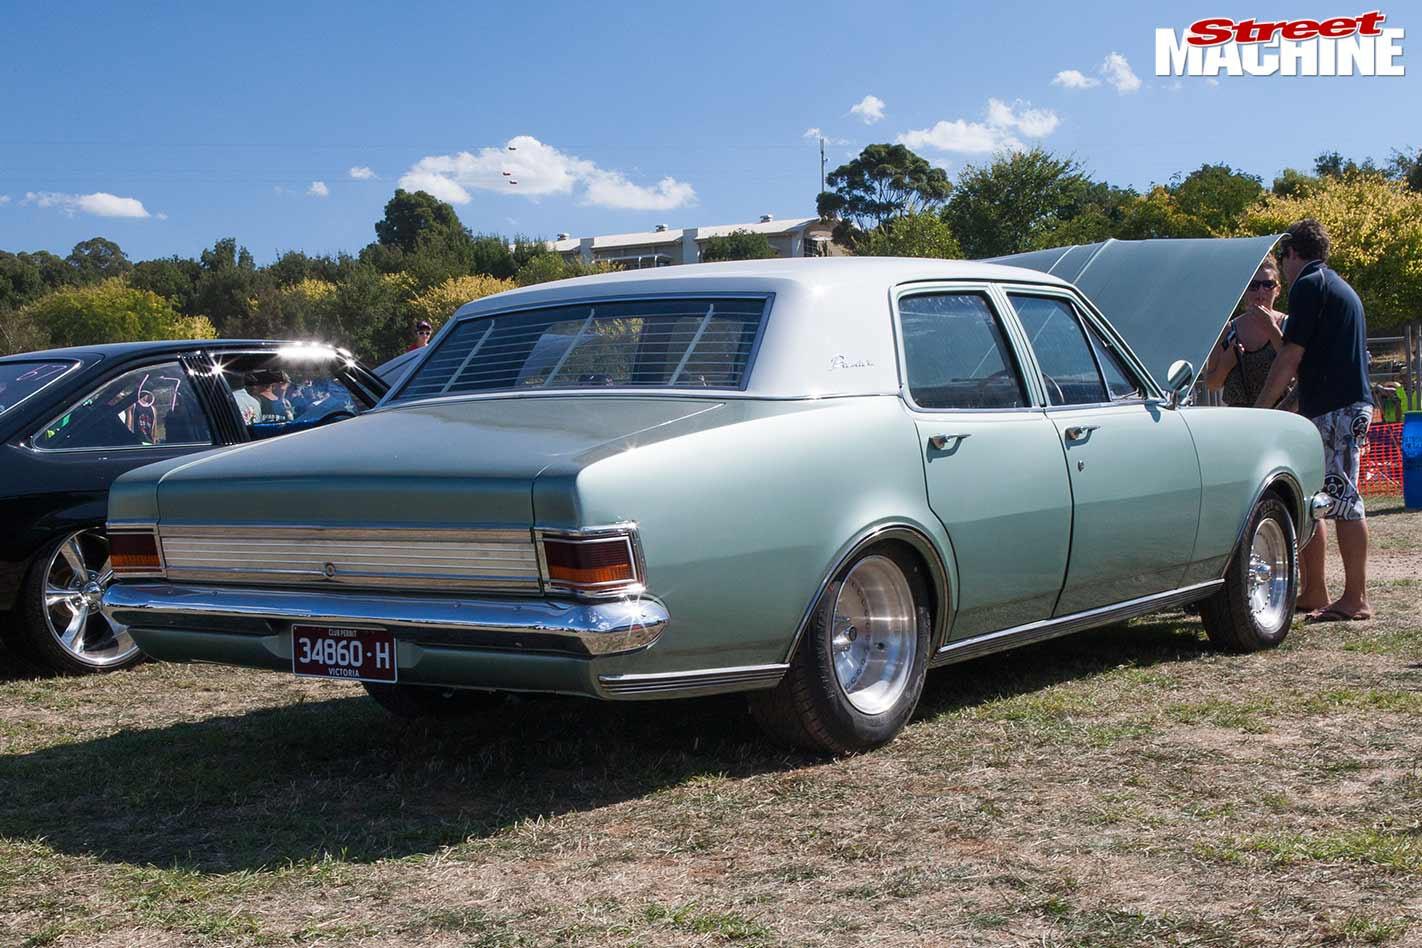 LS1 powered Holden HG Premier